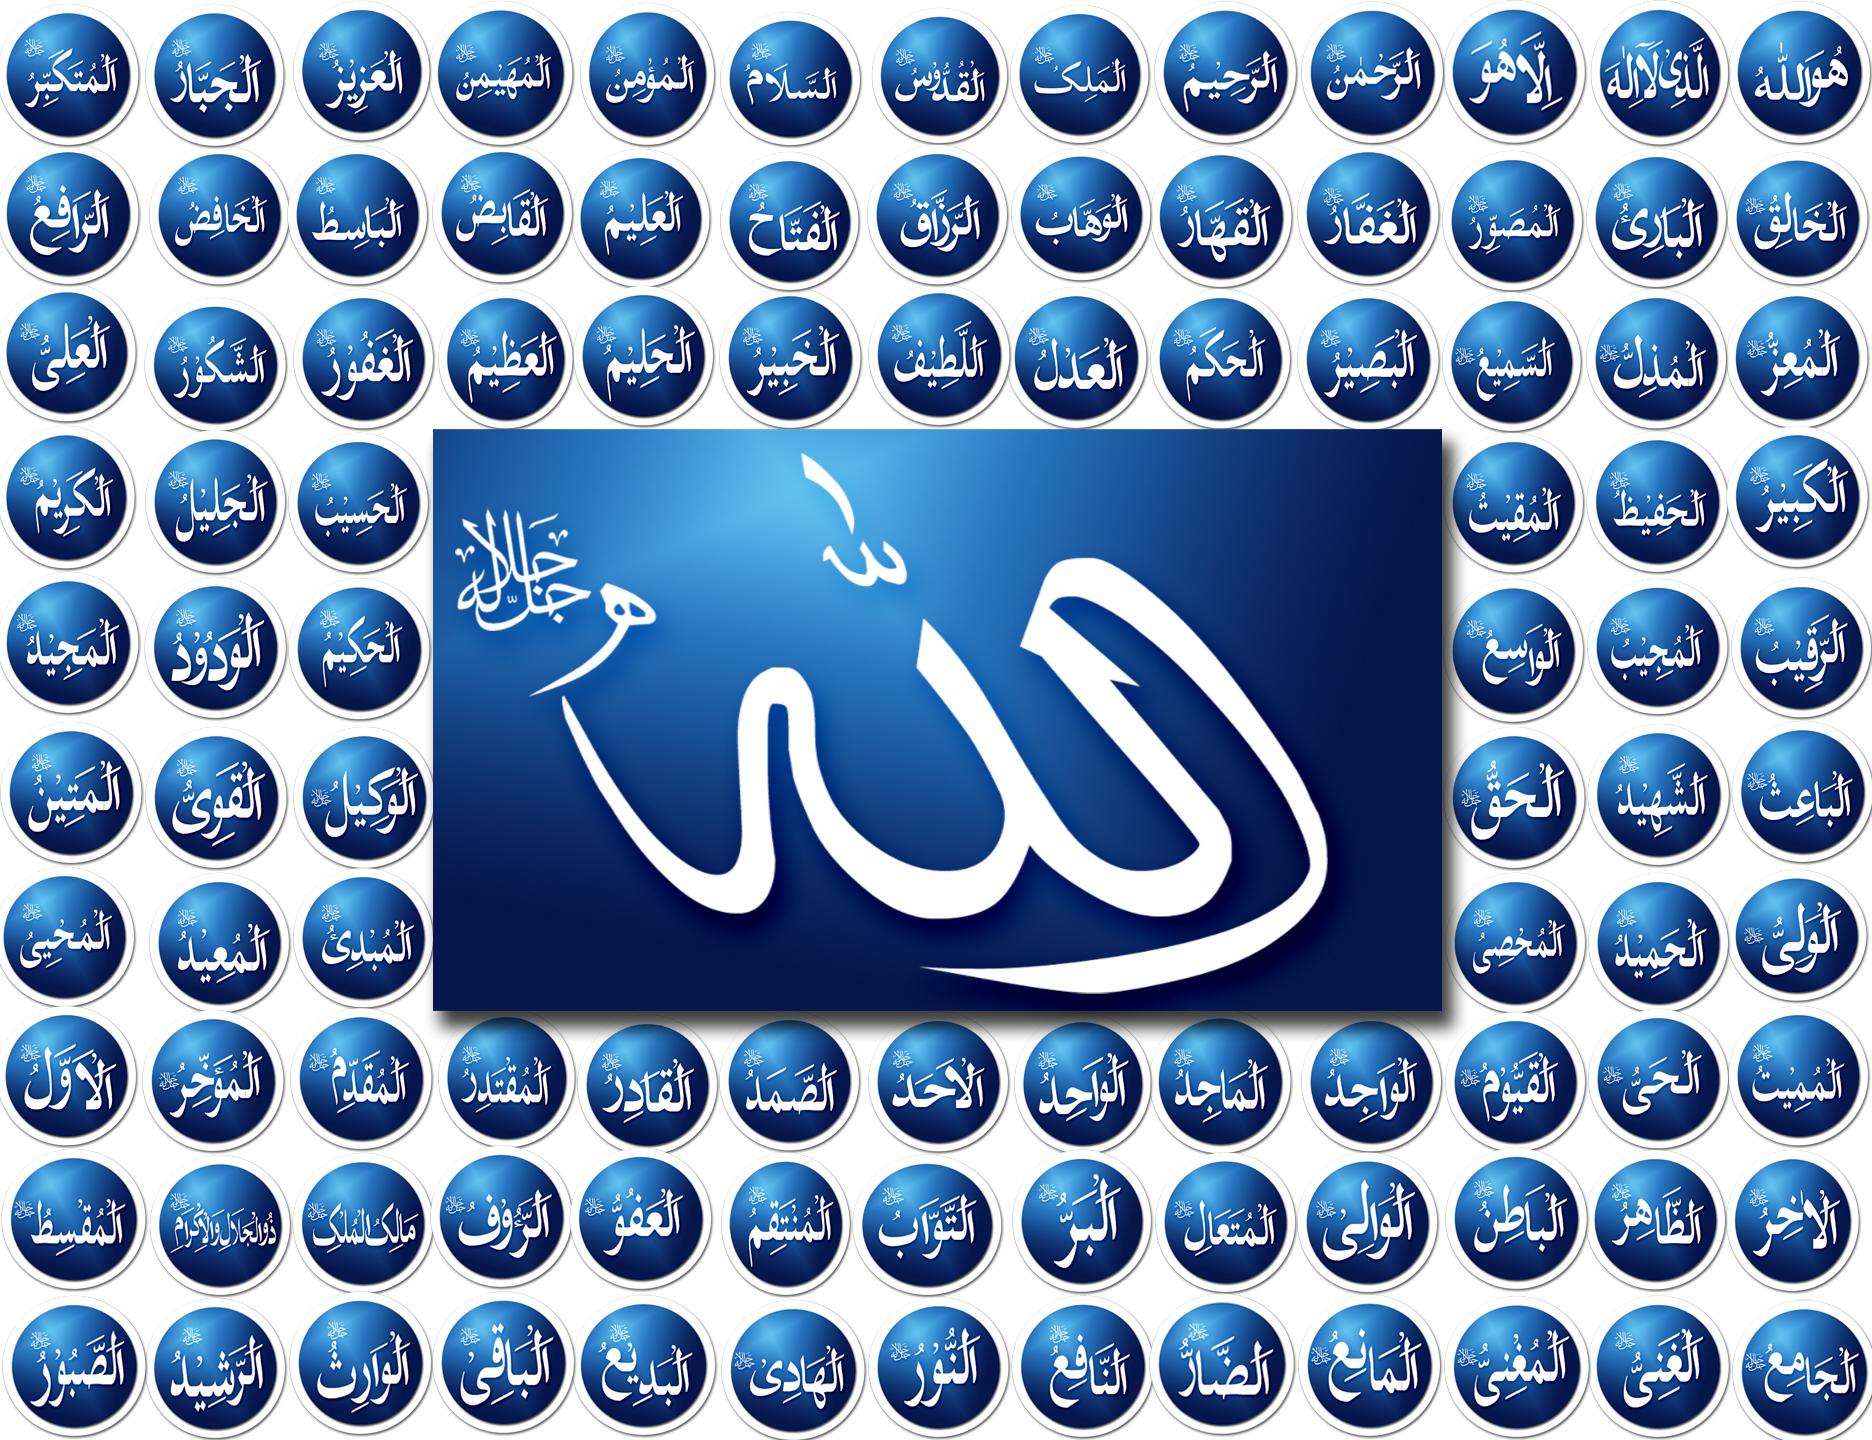 Memorizing 99 Glorious Names of Allah Subhana Wa Ta'ala-99-names-allah-wallpaper-jpg